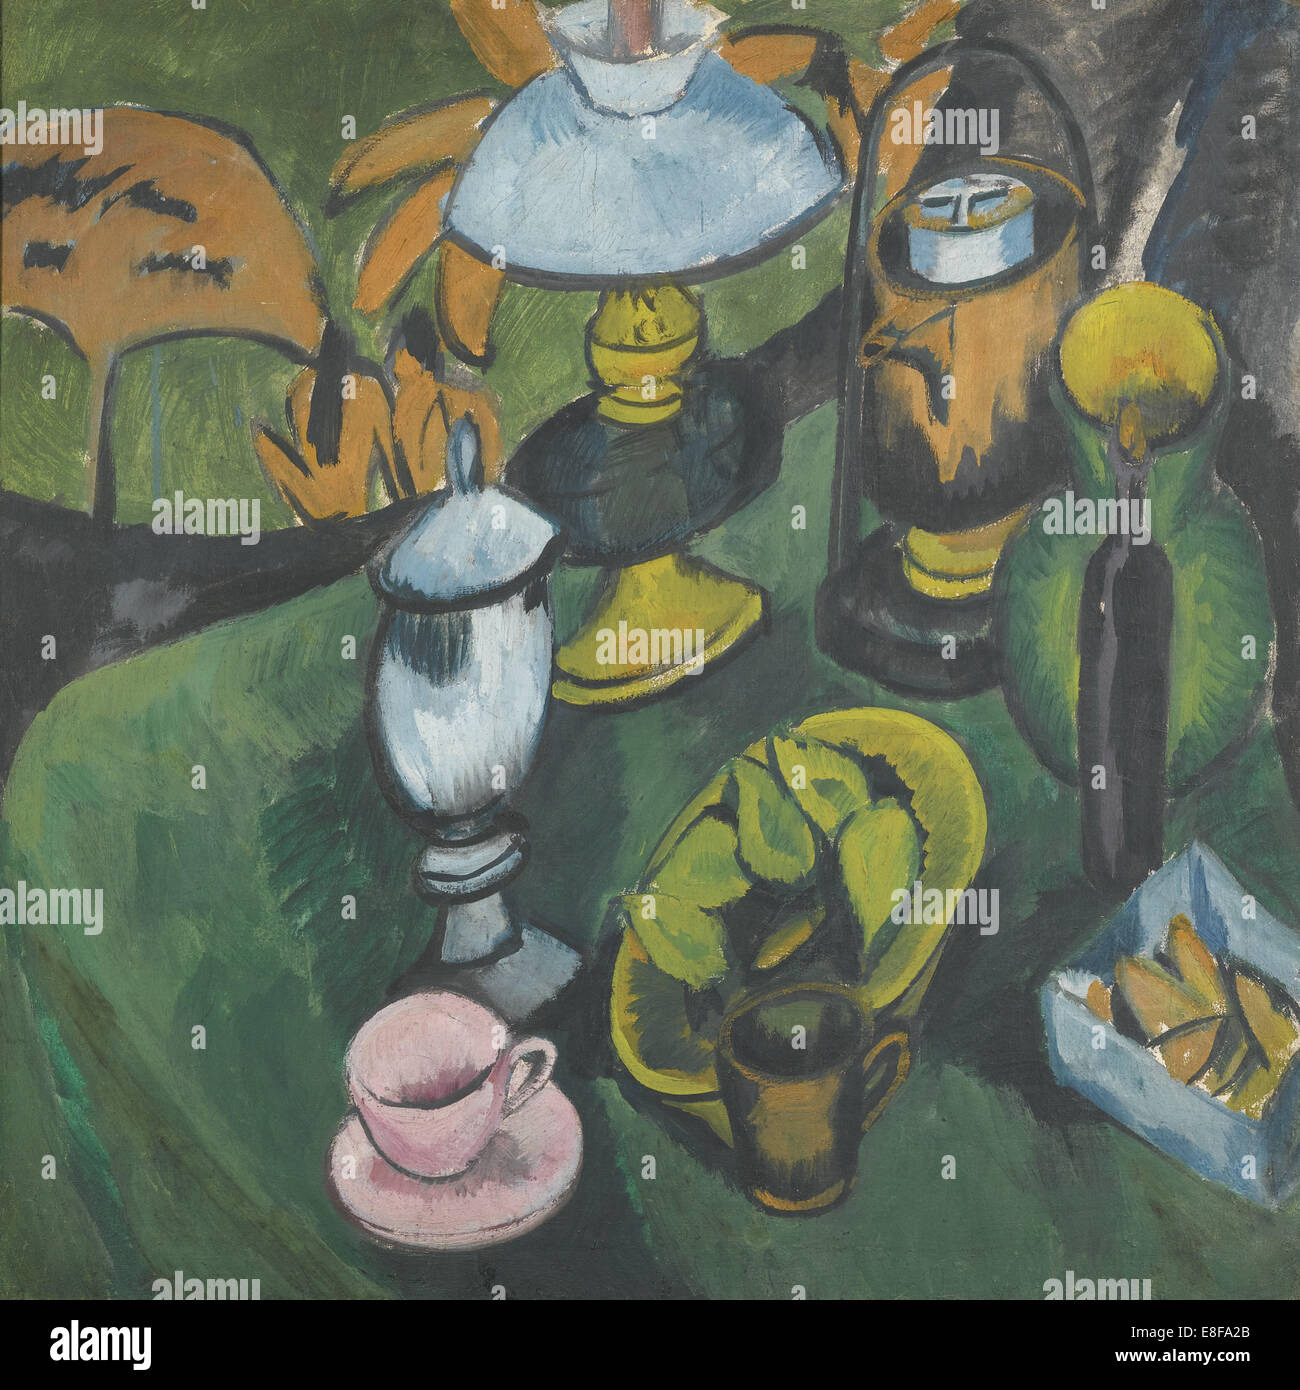 Still life with lamp. Artist: Kirchner, Ernst Ludwig (1880-1938) - Stock Image